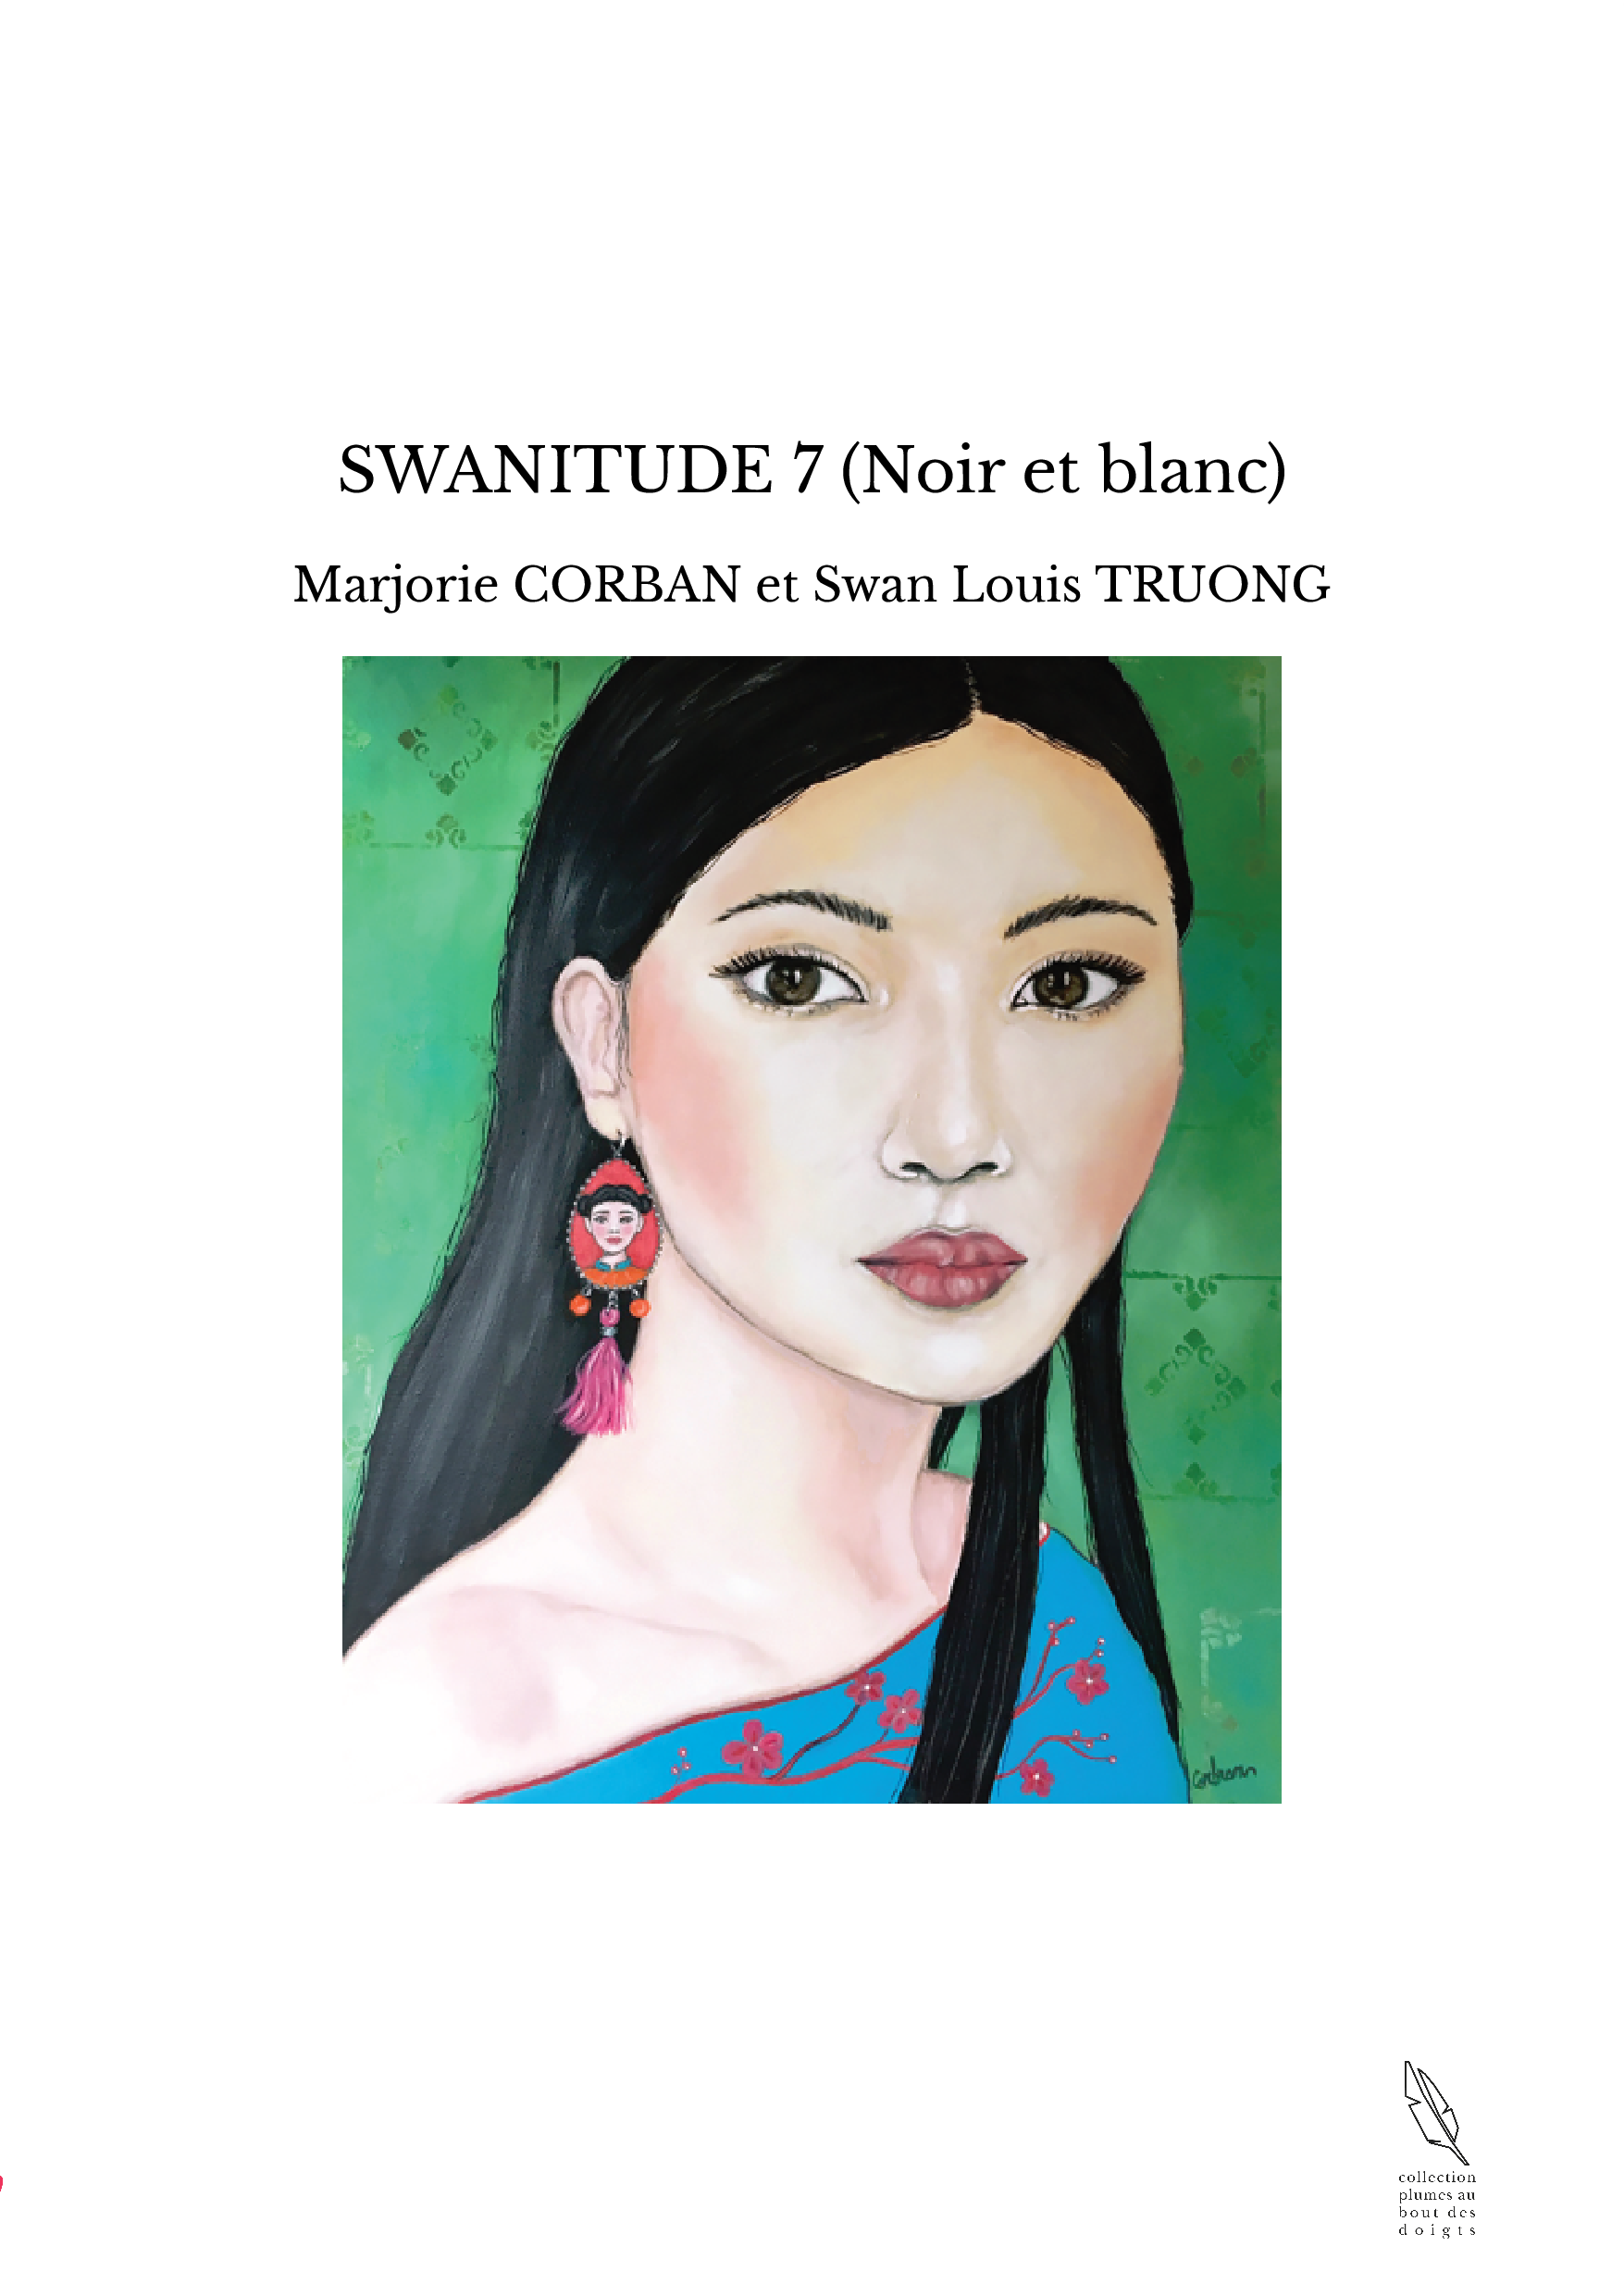 SWANITUDE 7 (Noir et blanc)